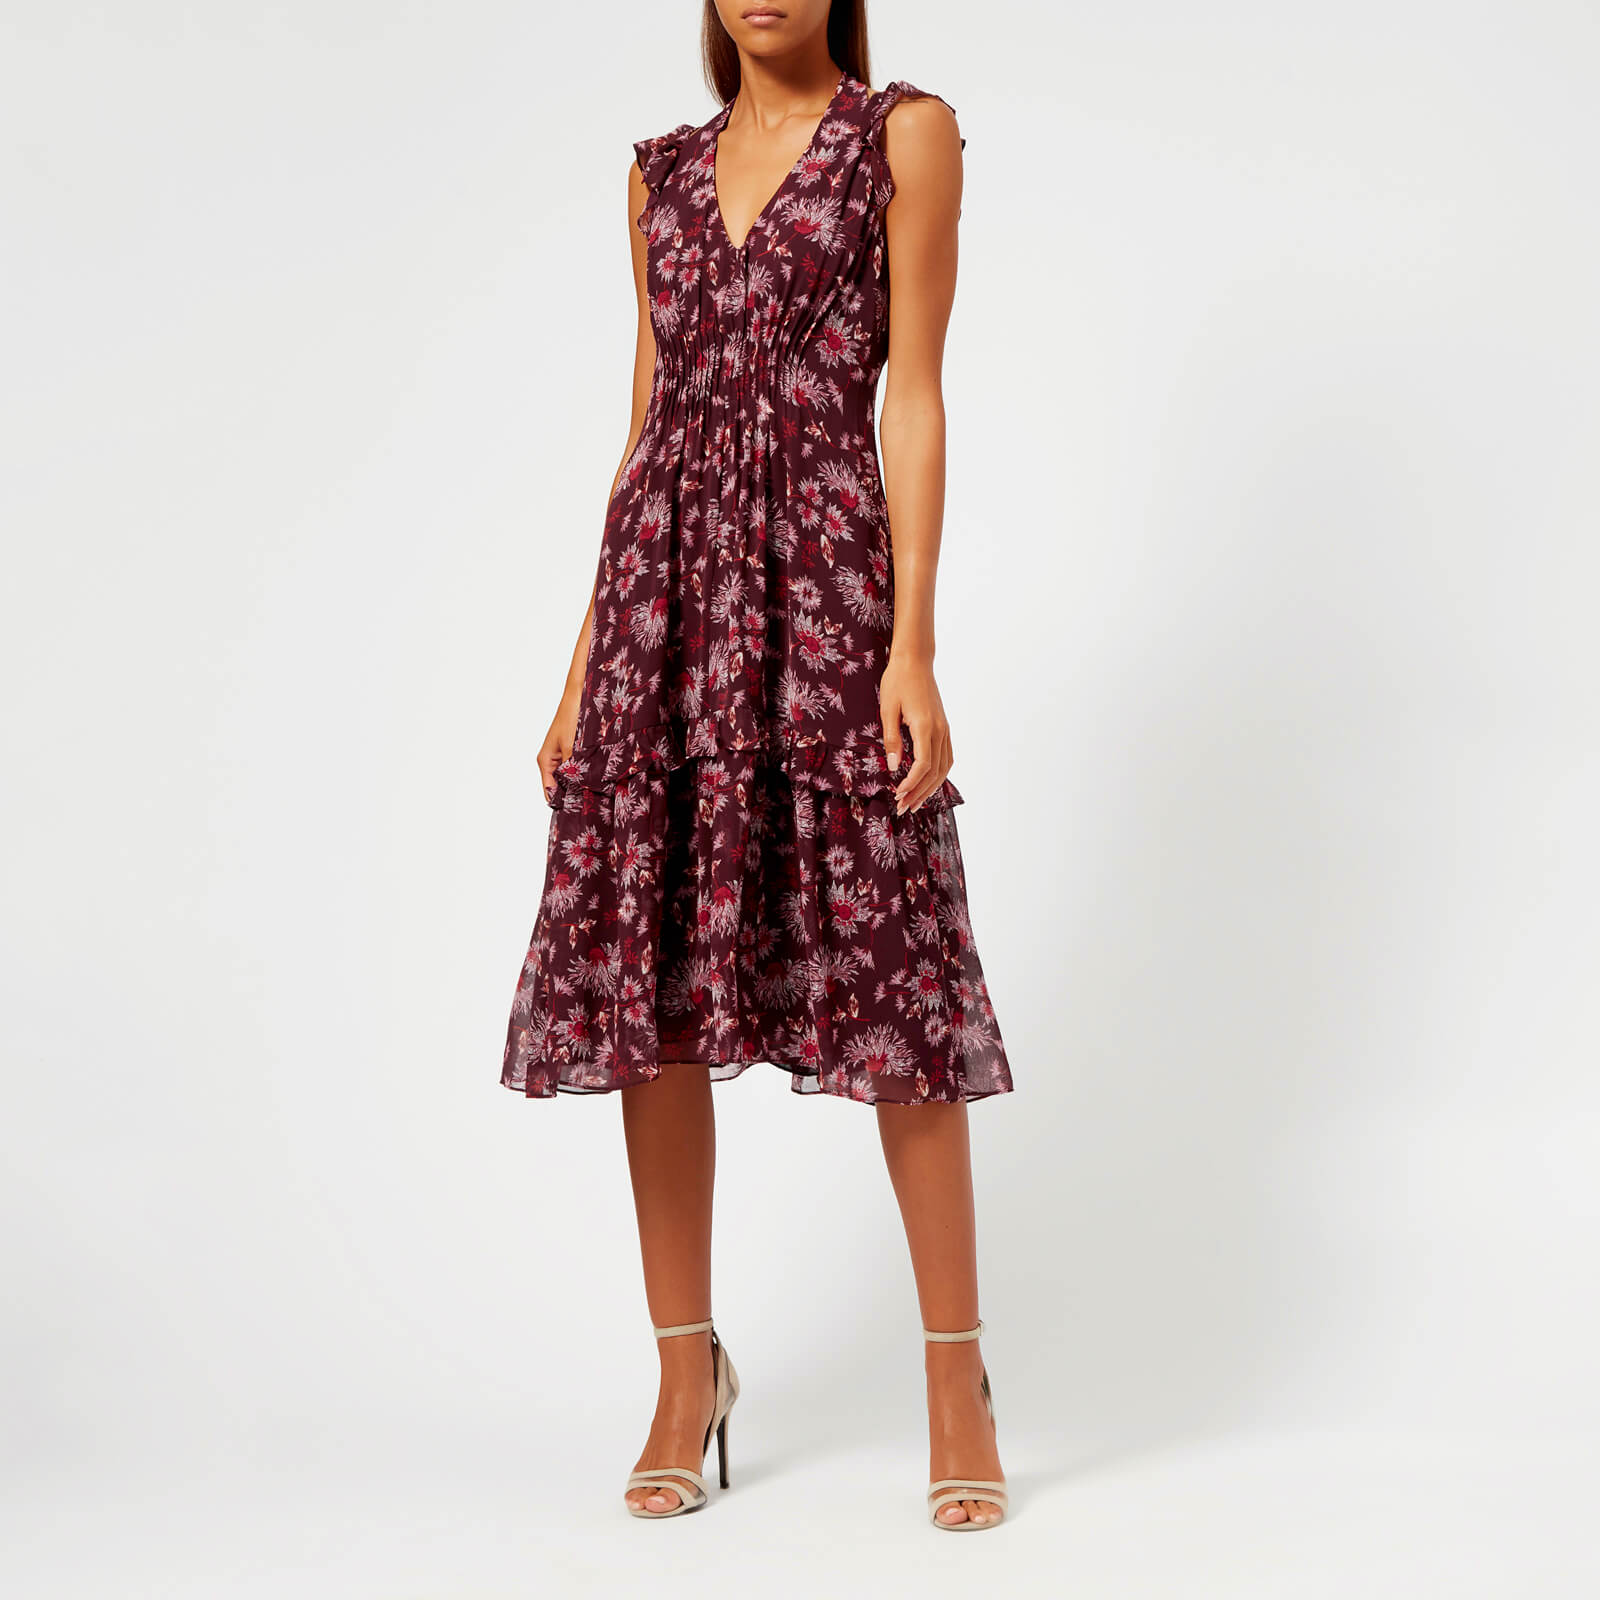 47c4b5dae17 Whistles Women s Pitti Print Double Strap Dress - Pink Multi Womens  Clothing